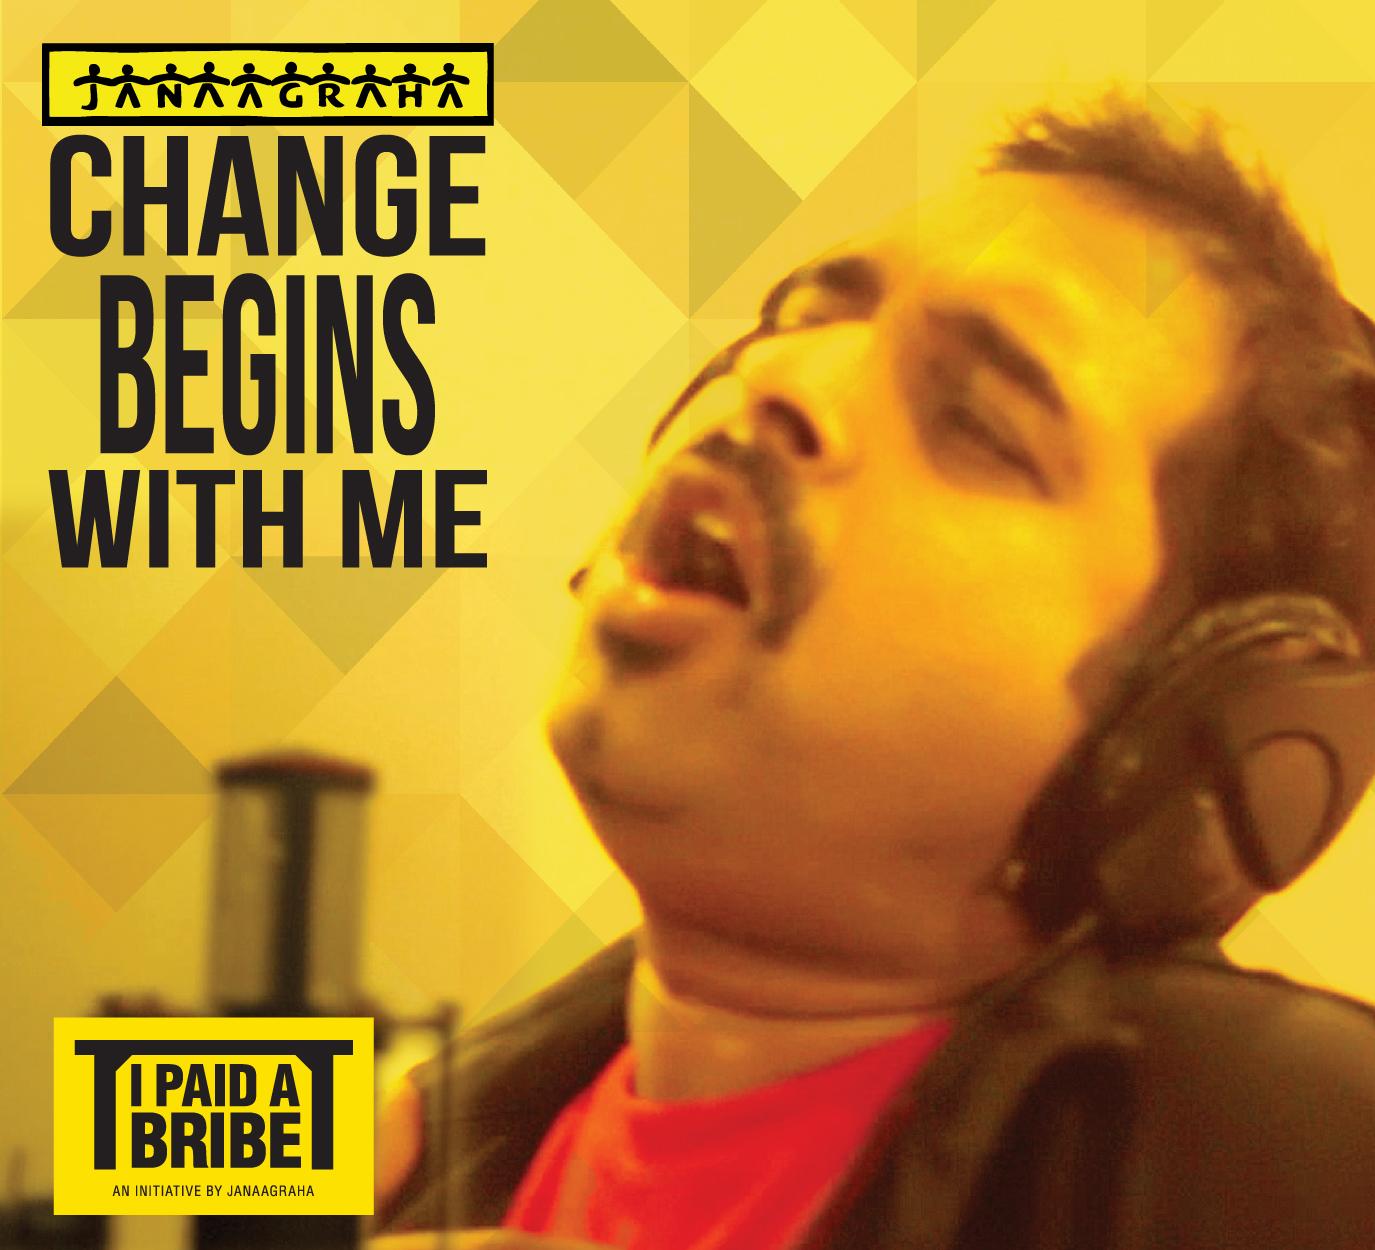 Mujhse Hogi Shurvaat - I Paid a Bribe & Shankar Mahadevan Academy Collaboration